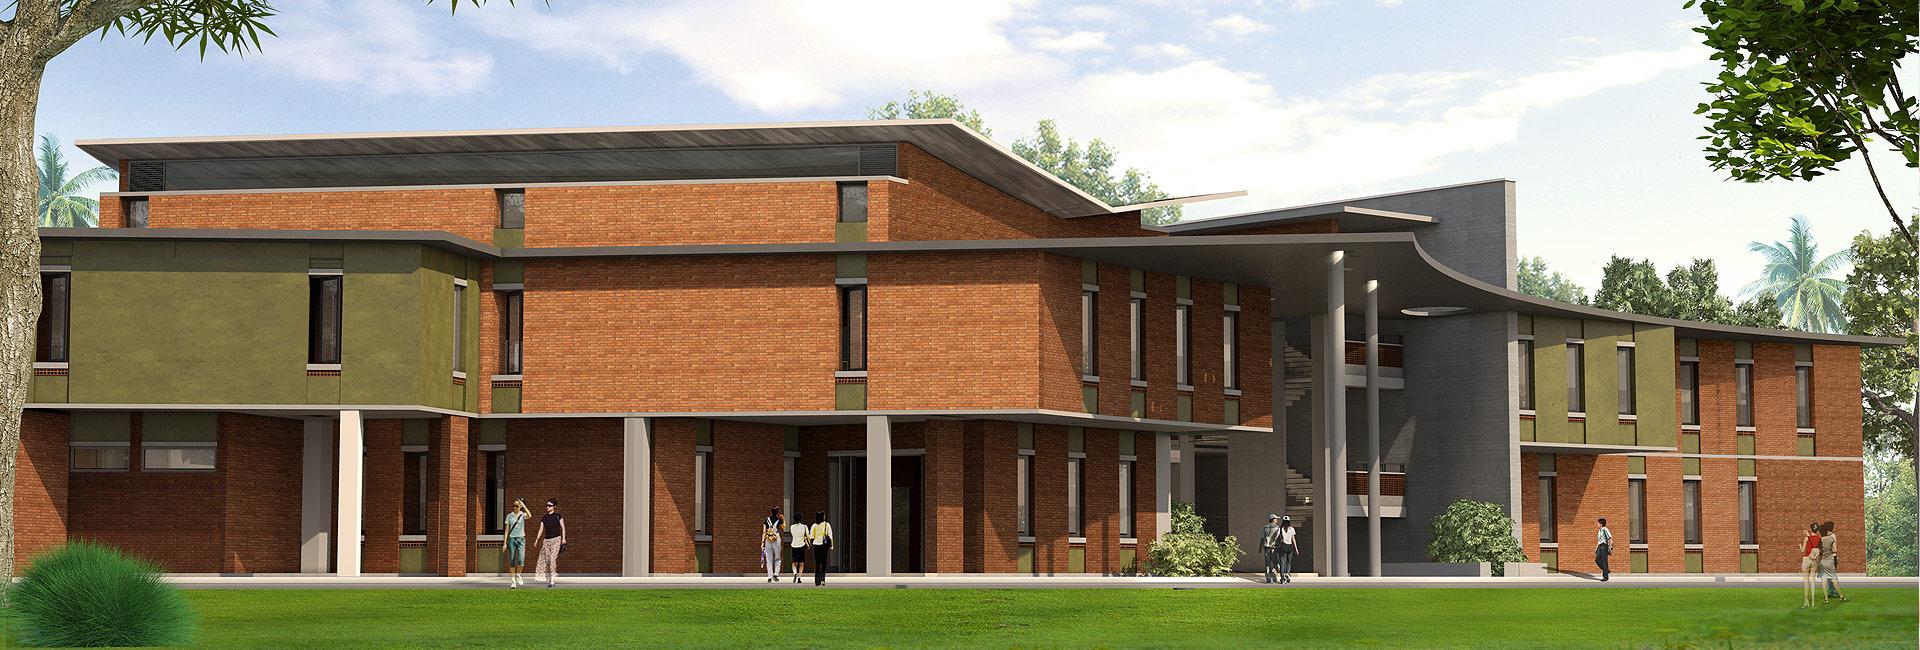 Marian College of Architecture and Planning, Thiruvananthapuram